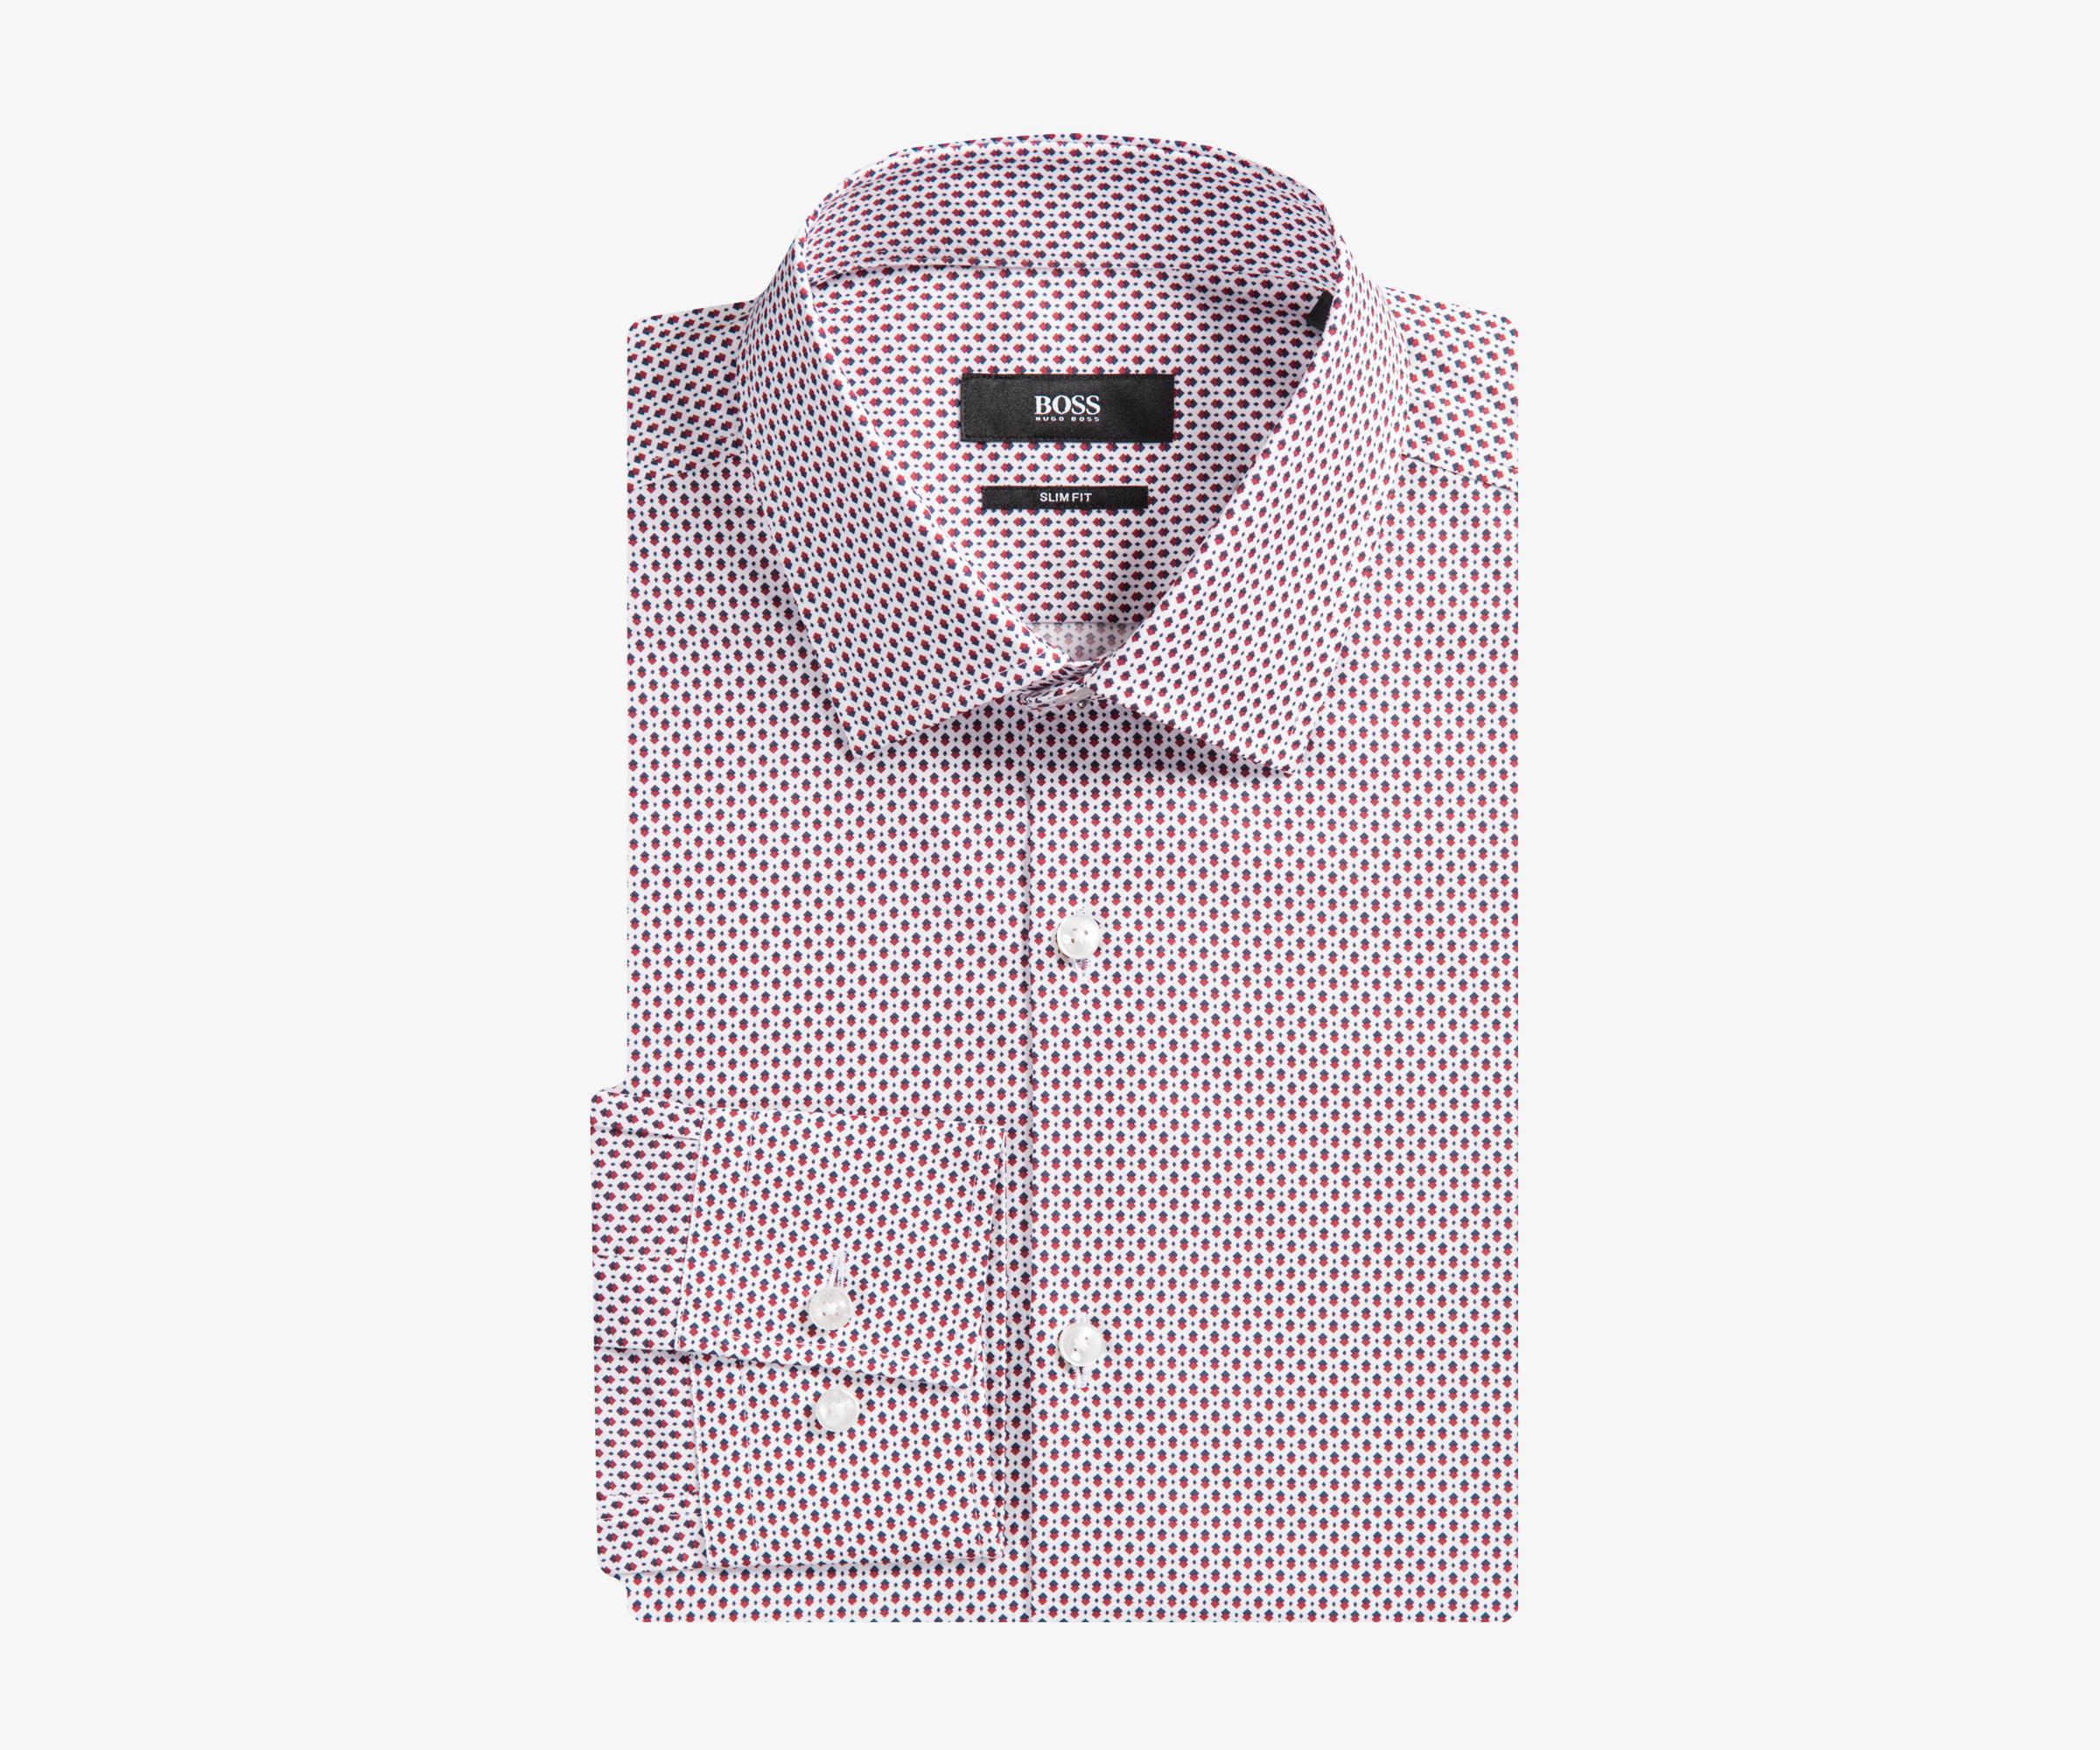 b57e141db BOSS 'jenno' Diamond Print Shirt Red/navy for Men - Lyst